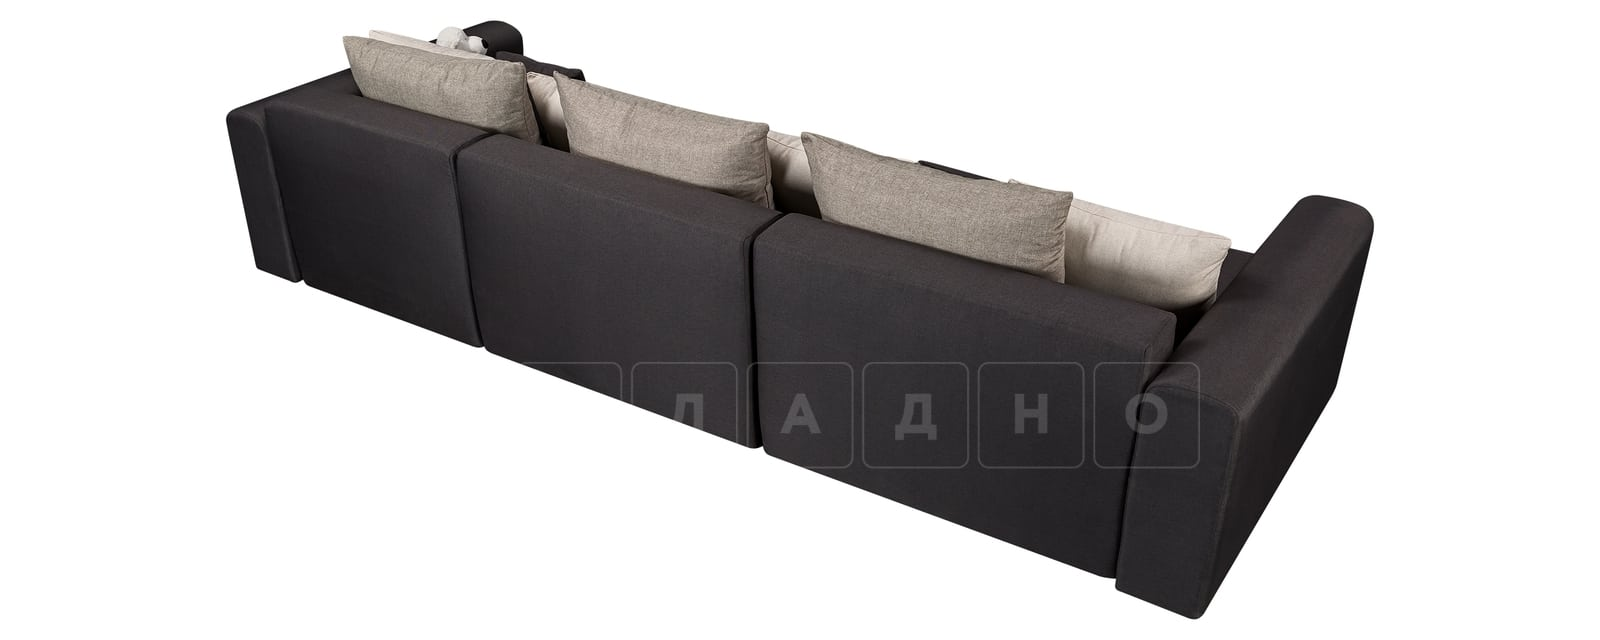 Диван Медисон темно-серый 325 см фото 3 | интернет-магазин Складно